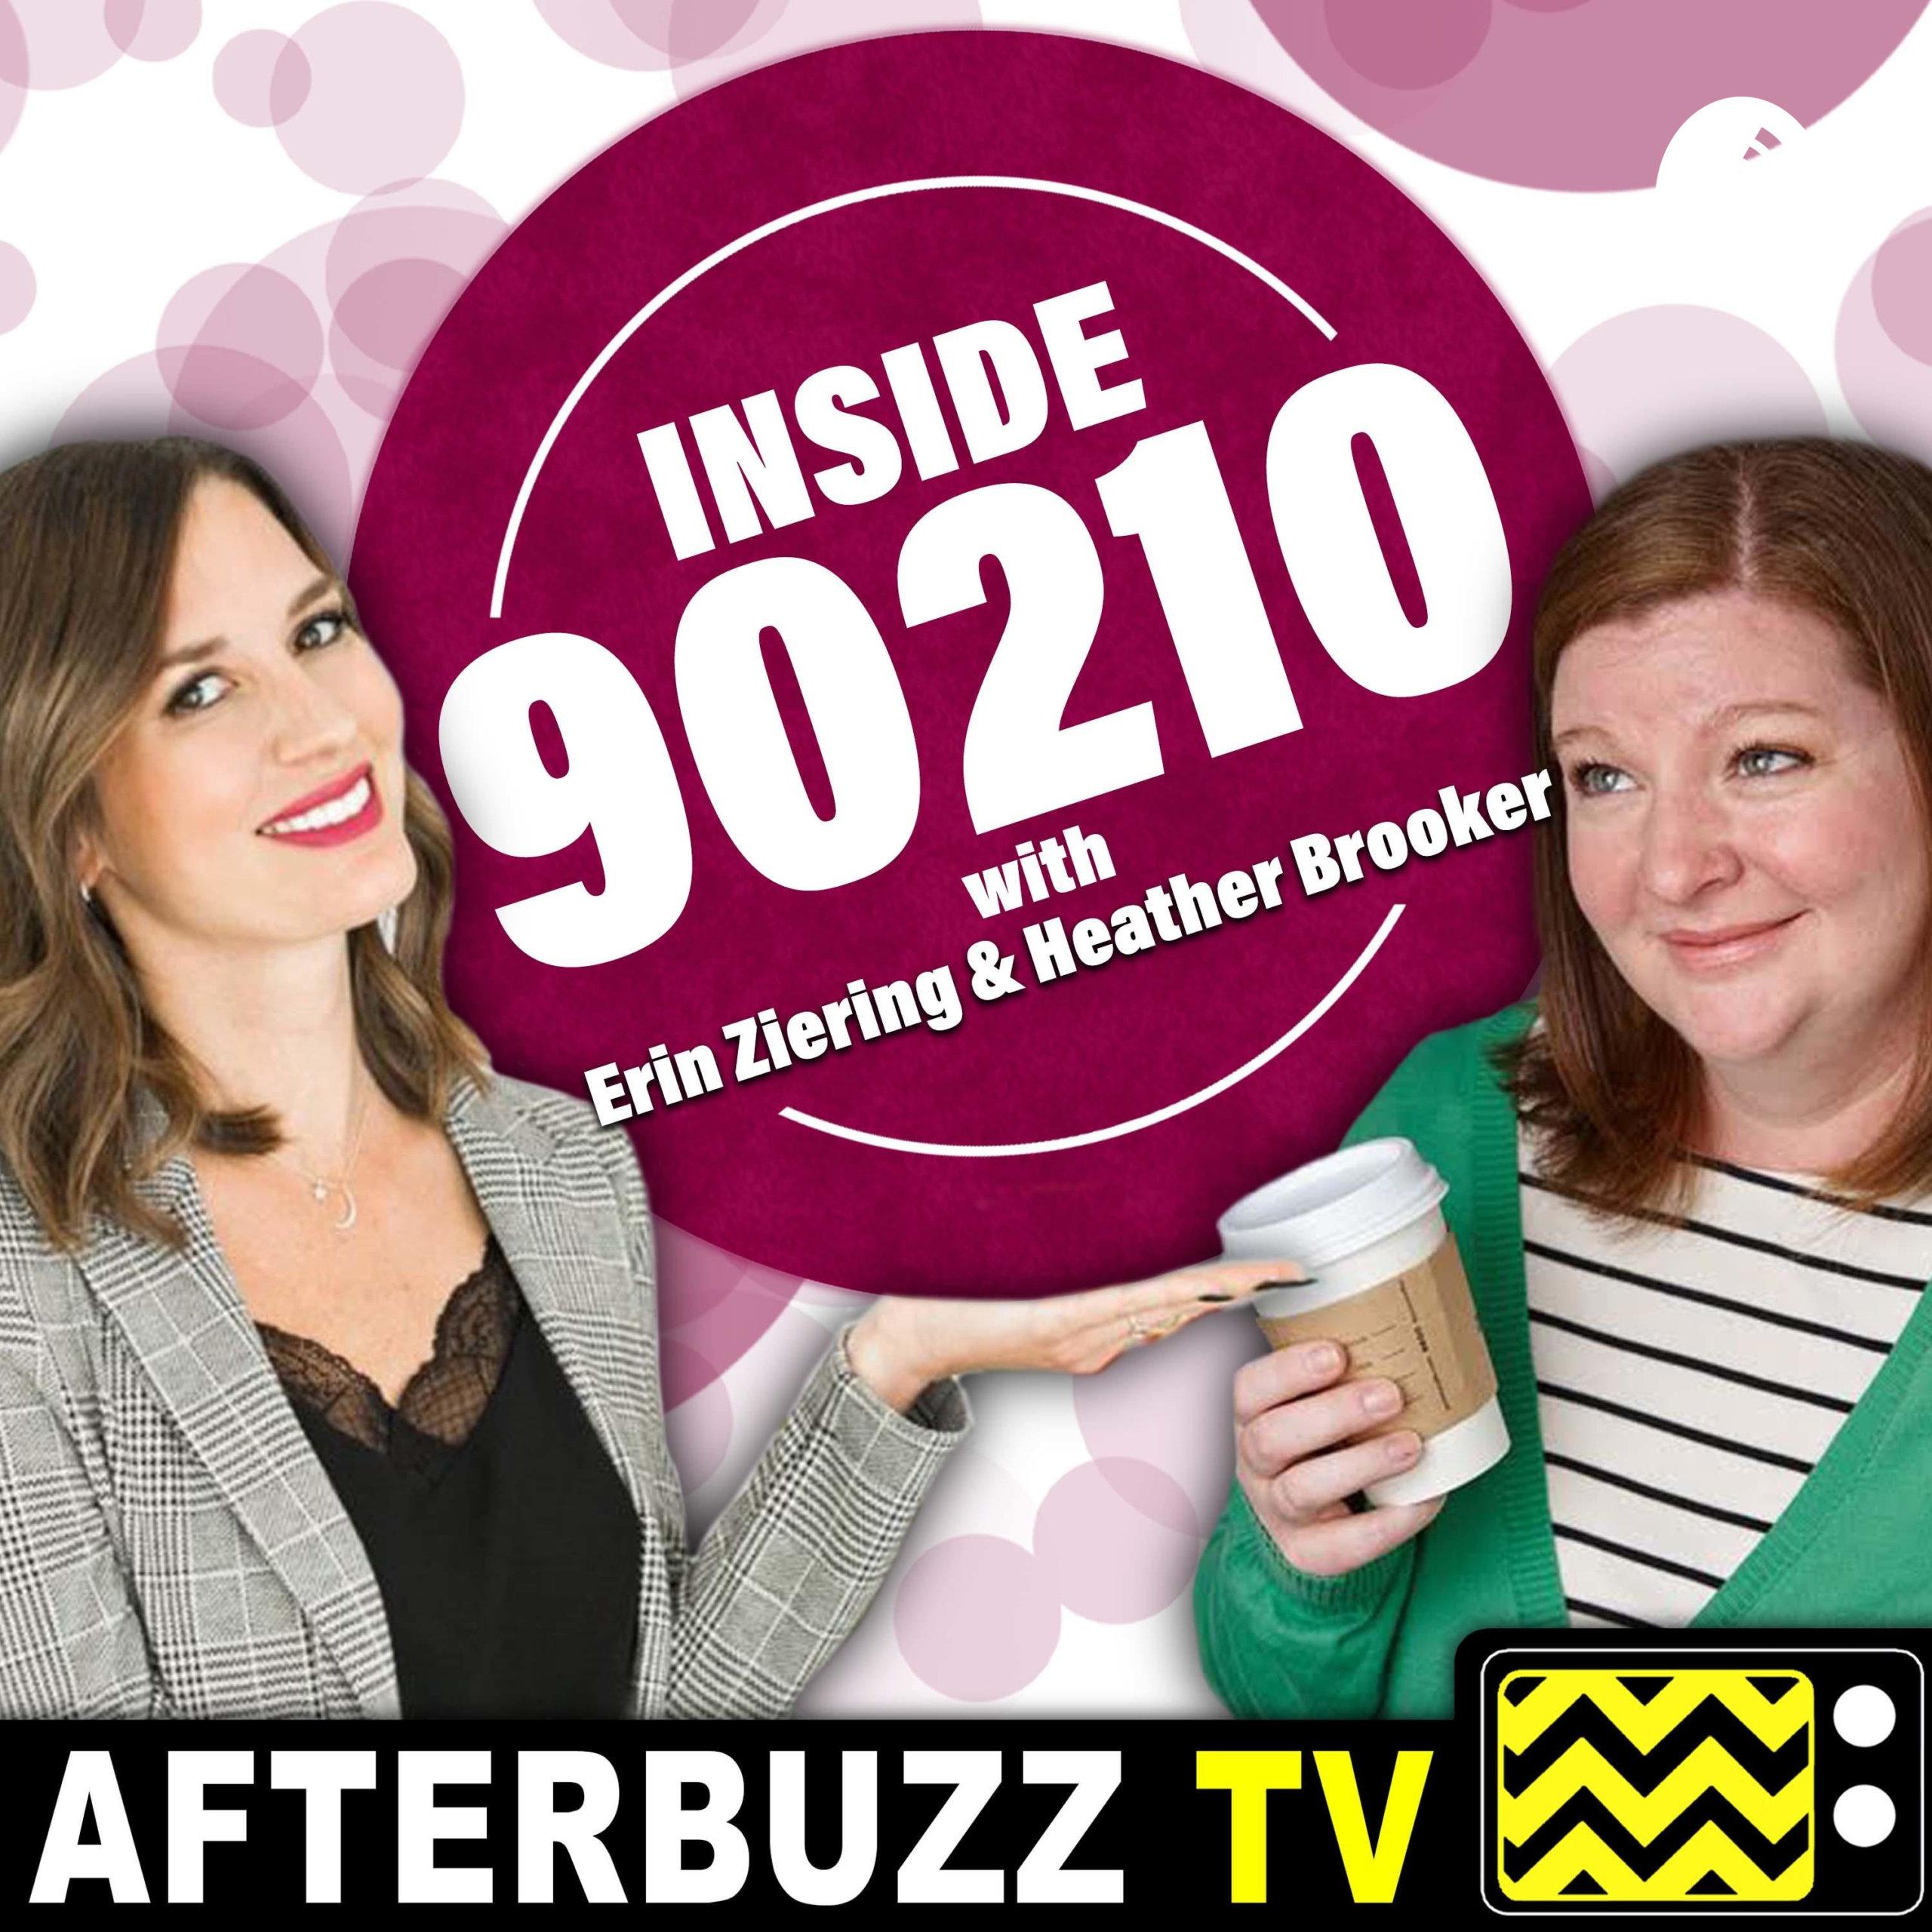 Inside 90210 with Erin Ziering & Heather Brooker